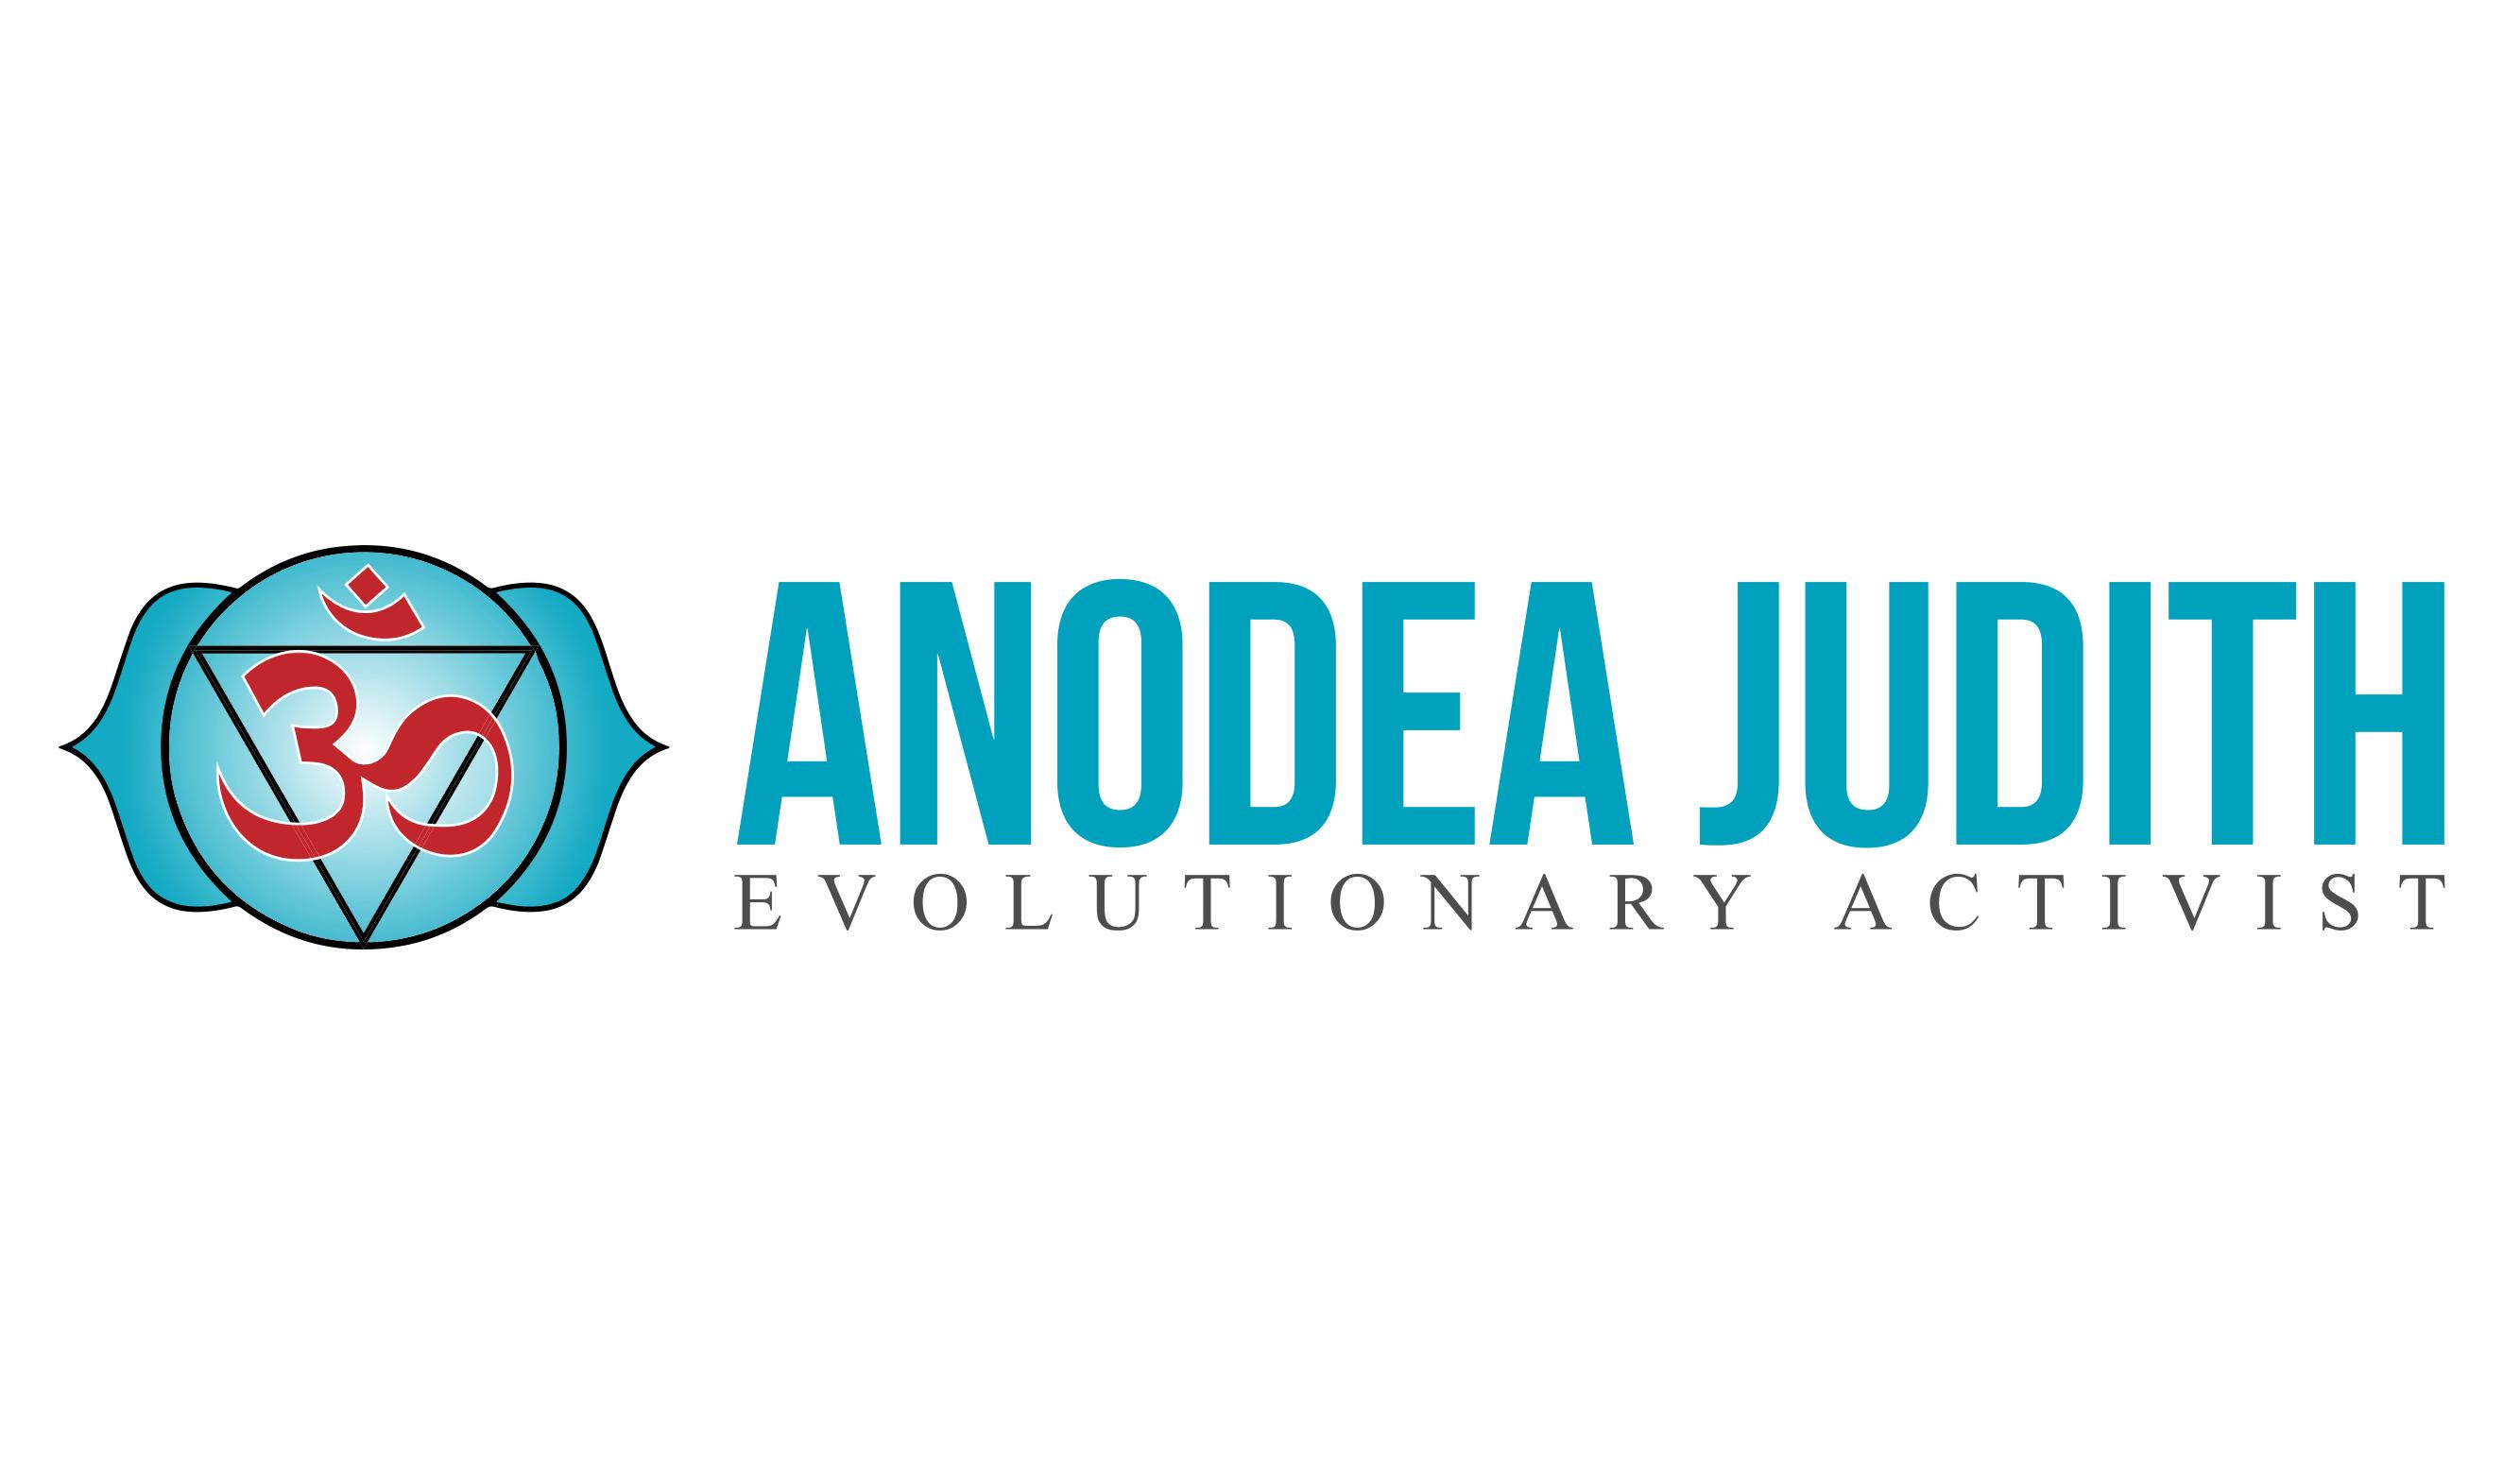 AnodeaJudith-LOGO-1.png